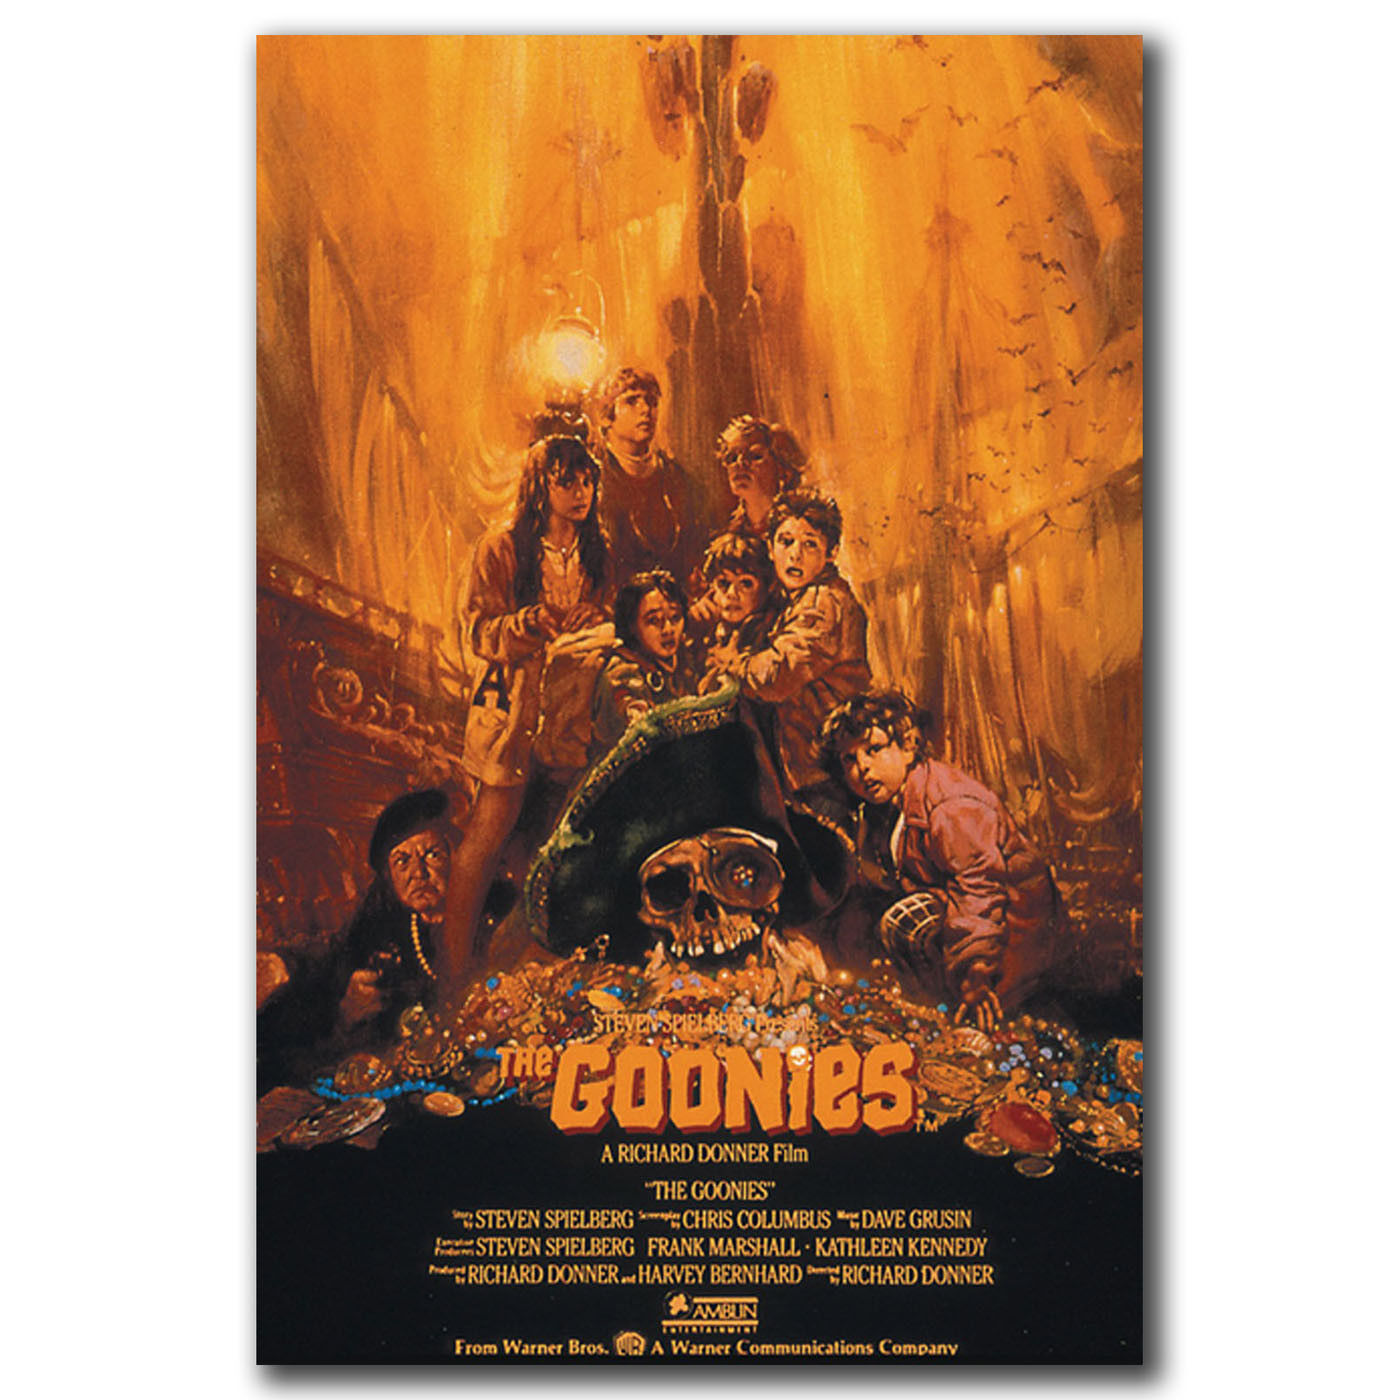 24x36 14x21 40 Poster The Goonies Movie Treasure Art Hot P-1553